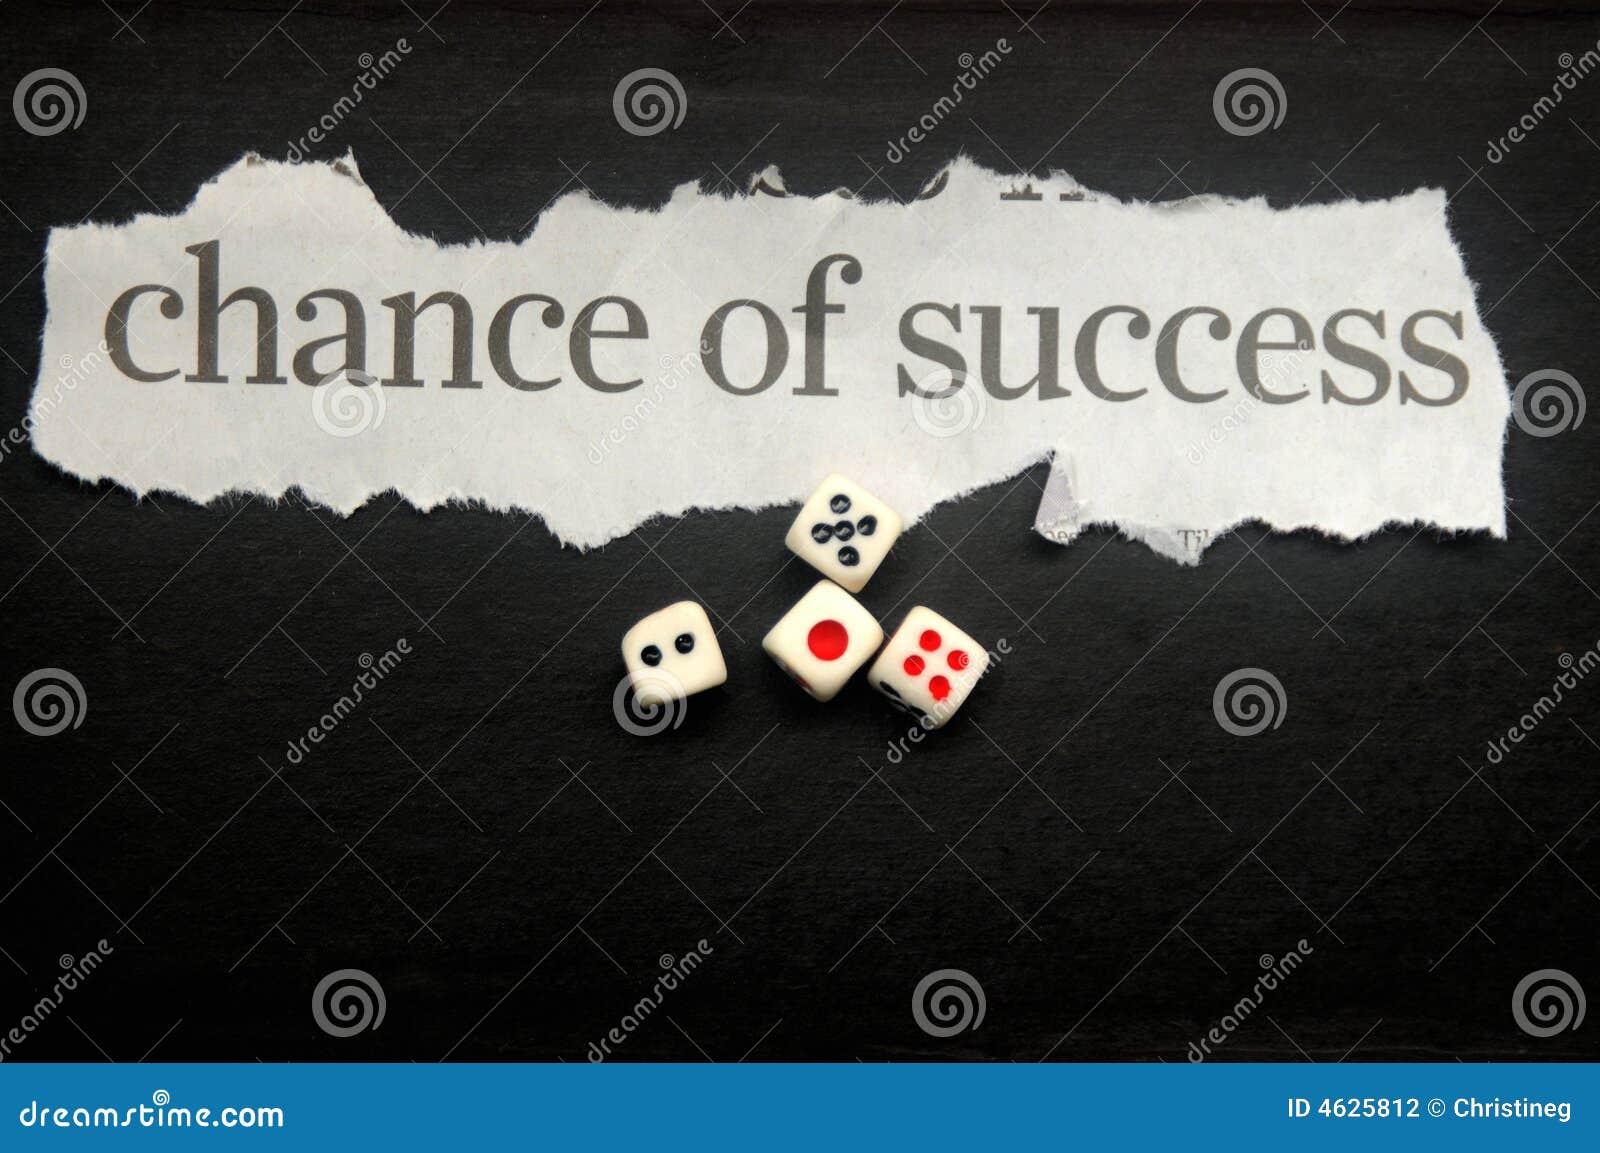 probability chances of success